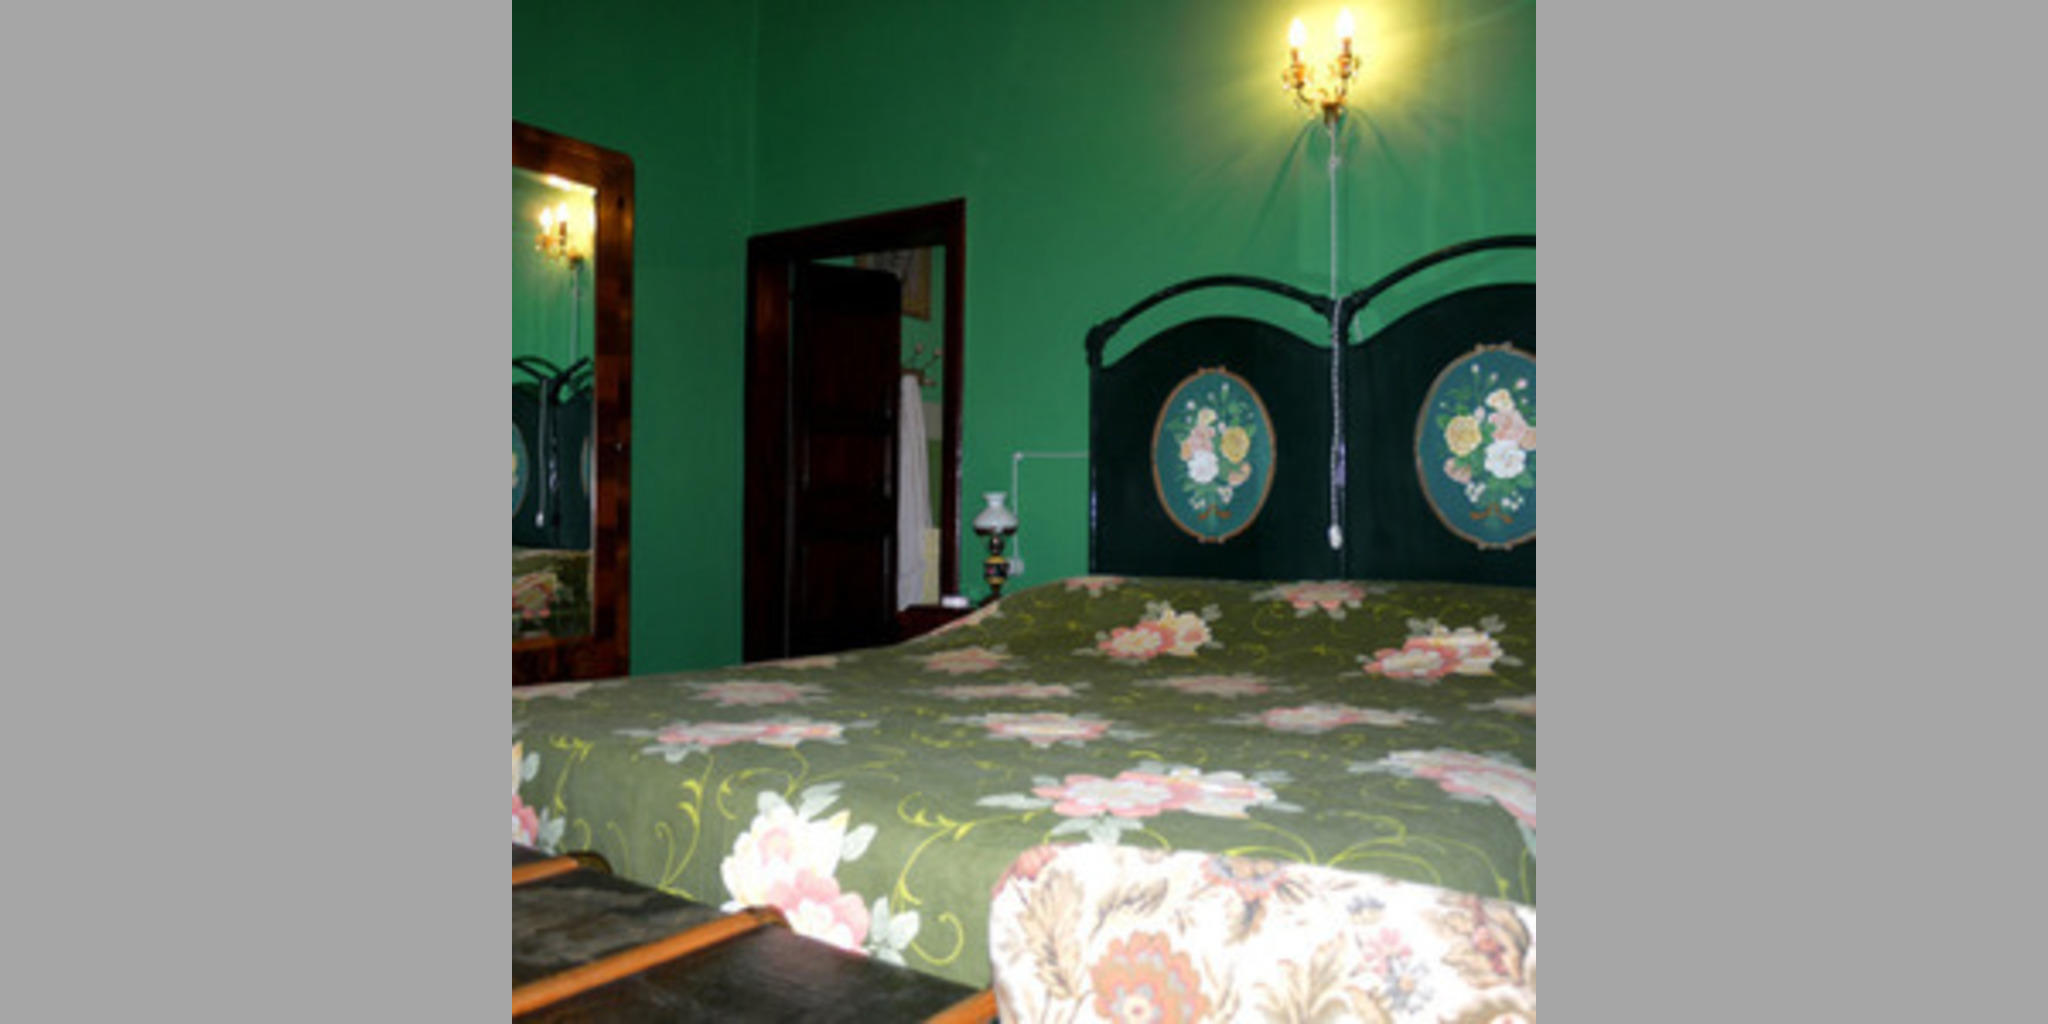 Bed & Breakfast Castel Ritaldi - Il Parco